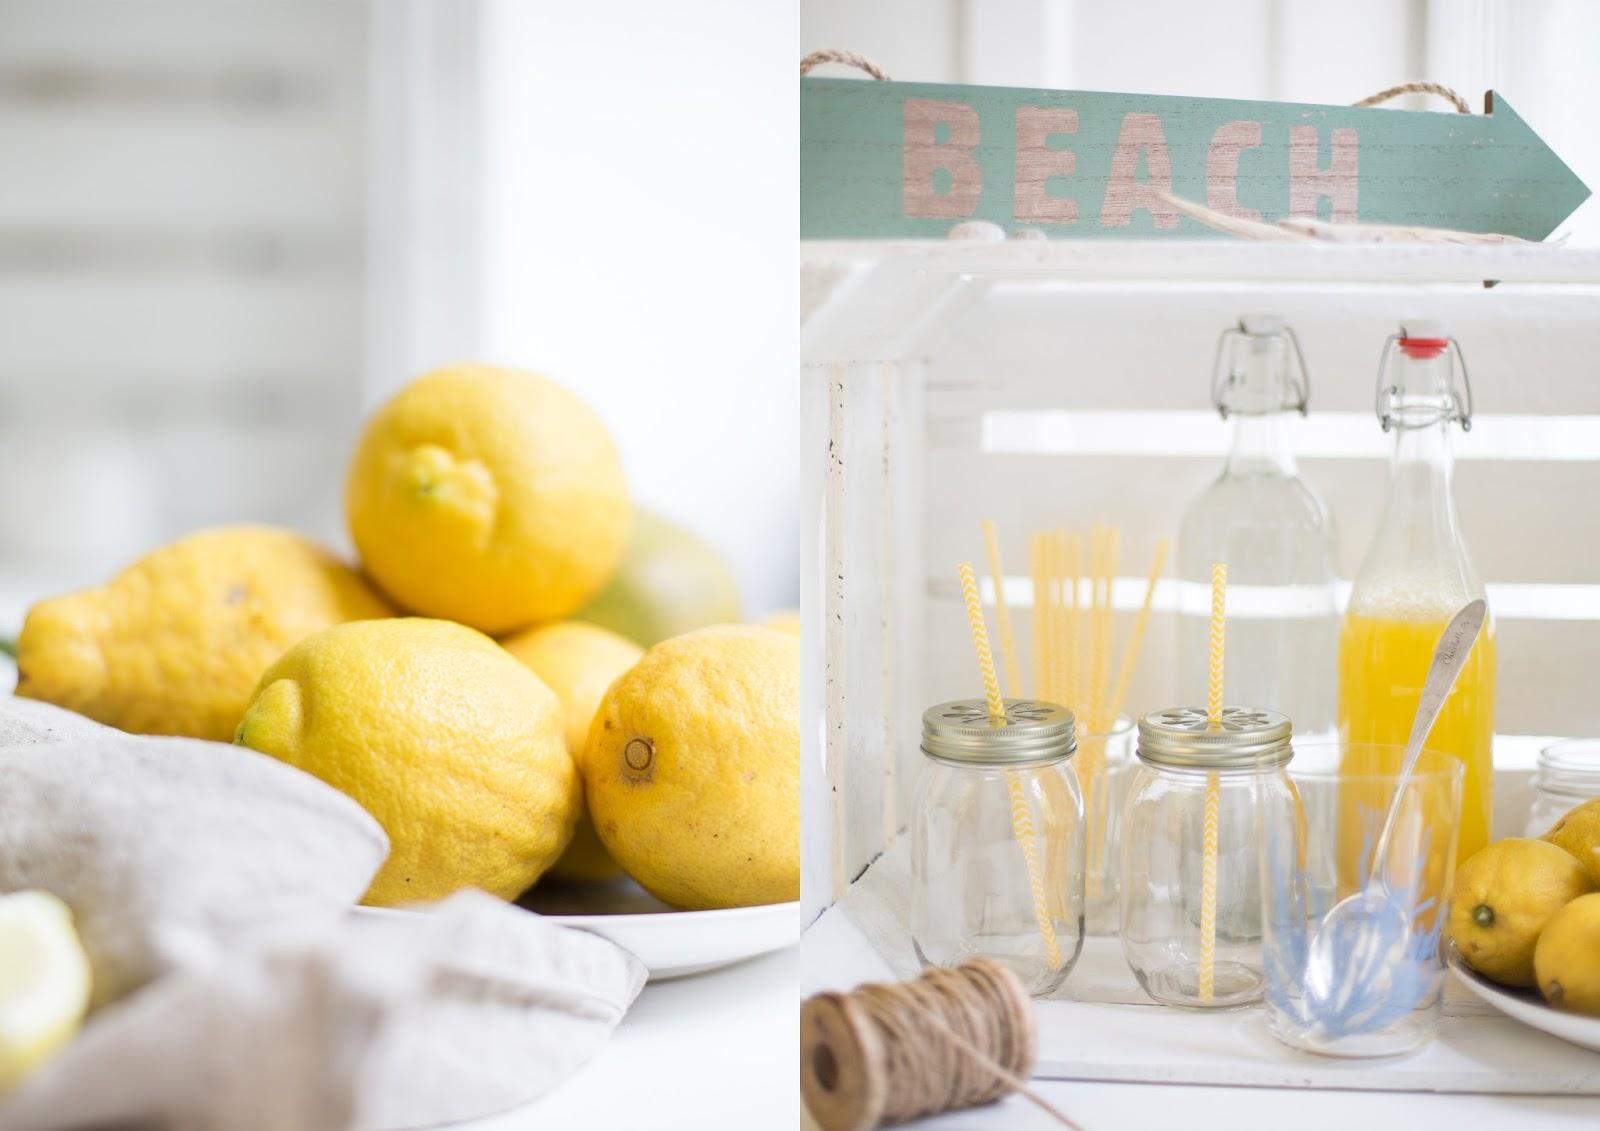 Mango-Zitronen-Limonade